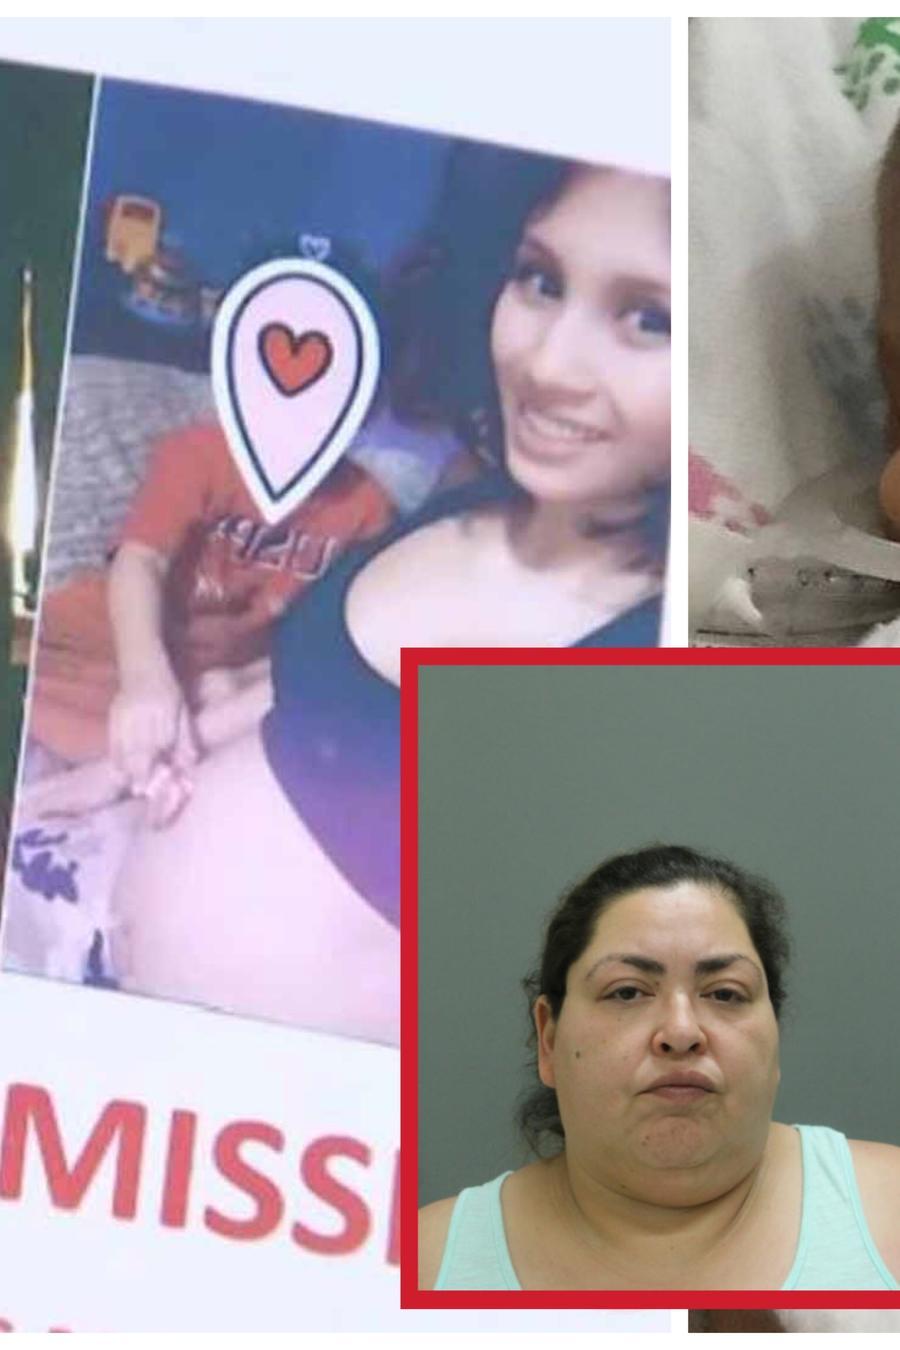 Marlen Ochoa, Yadiel y Clarisa Figueroa